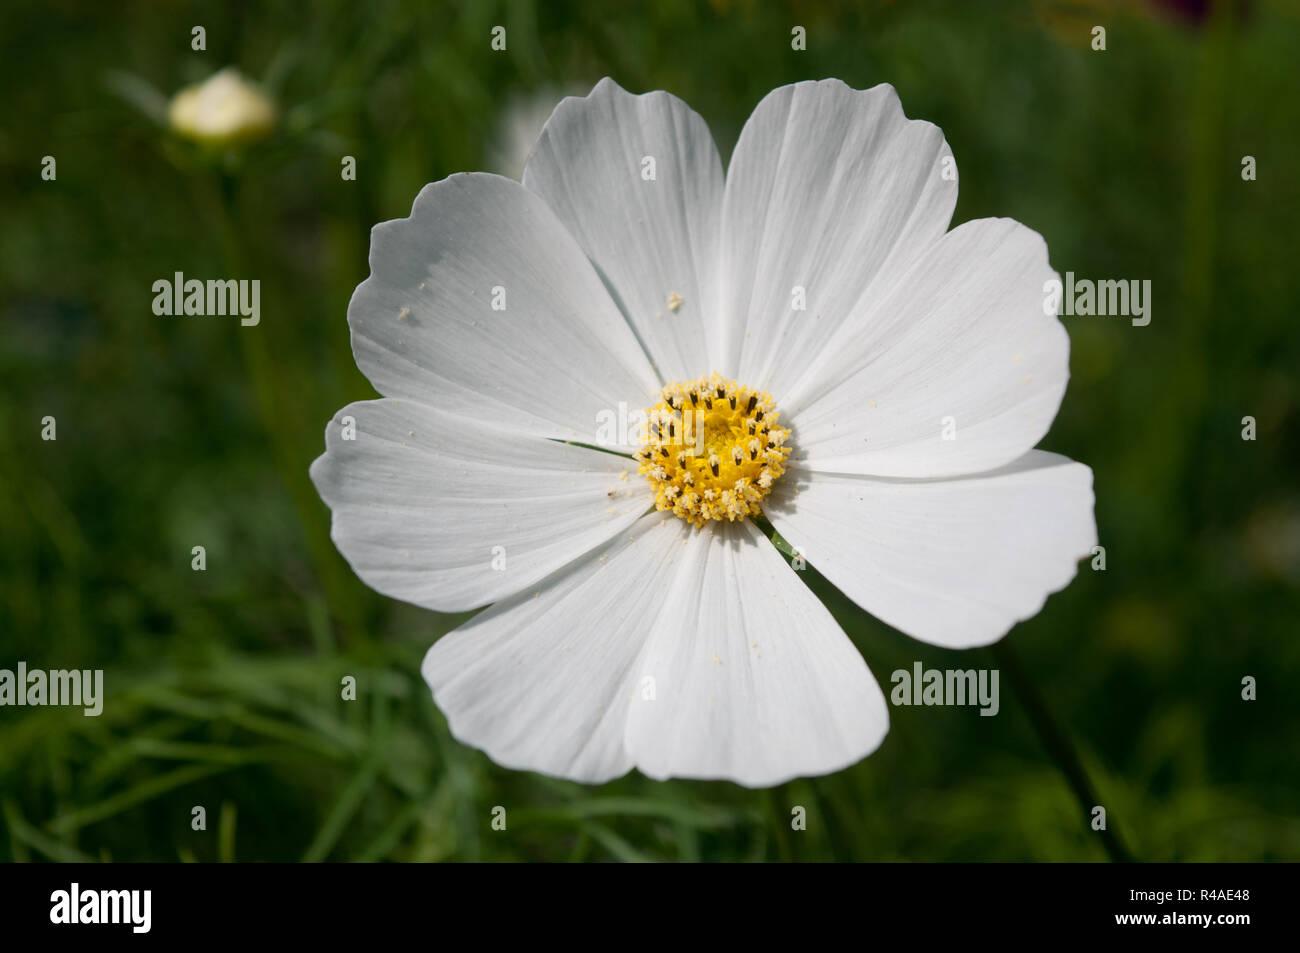 Good Morning Flower Stock Photo Alamy